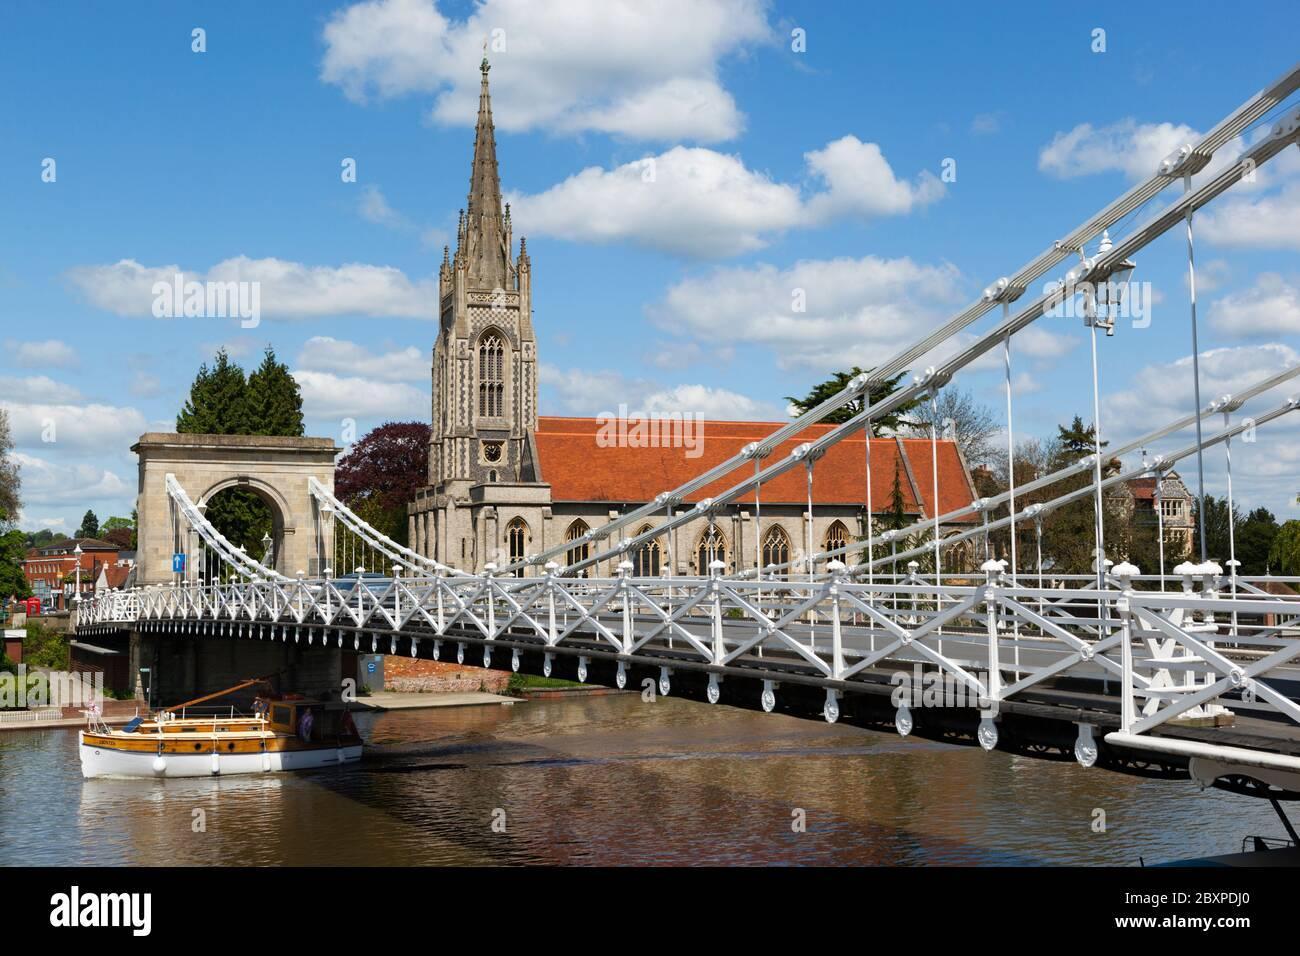 All Saints Church and suspension bridge, Marlow, Buckinghamshire, England, United Kingdom, Europe Stock Photo